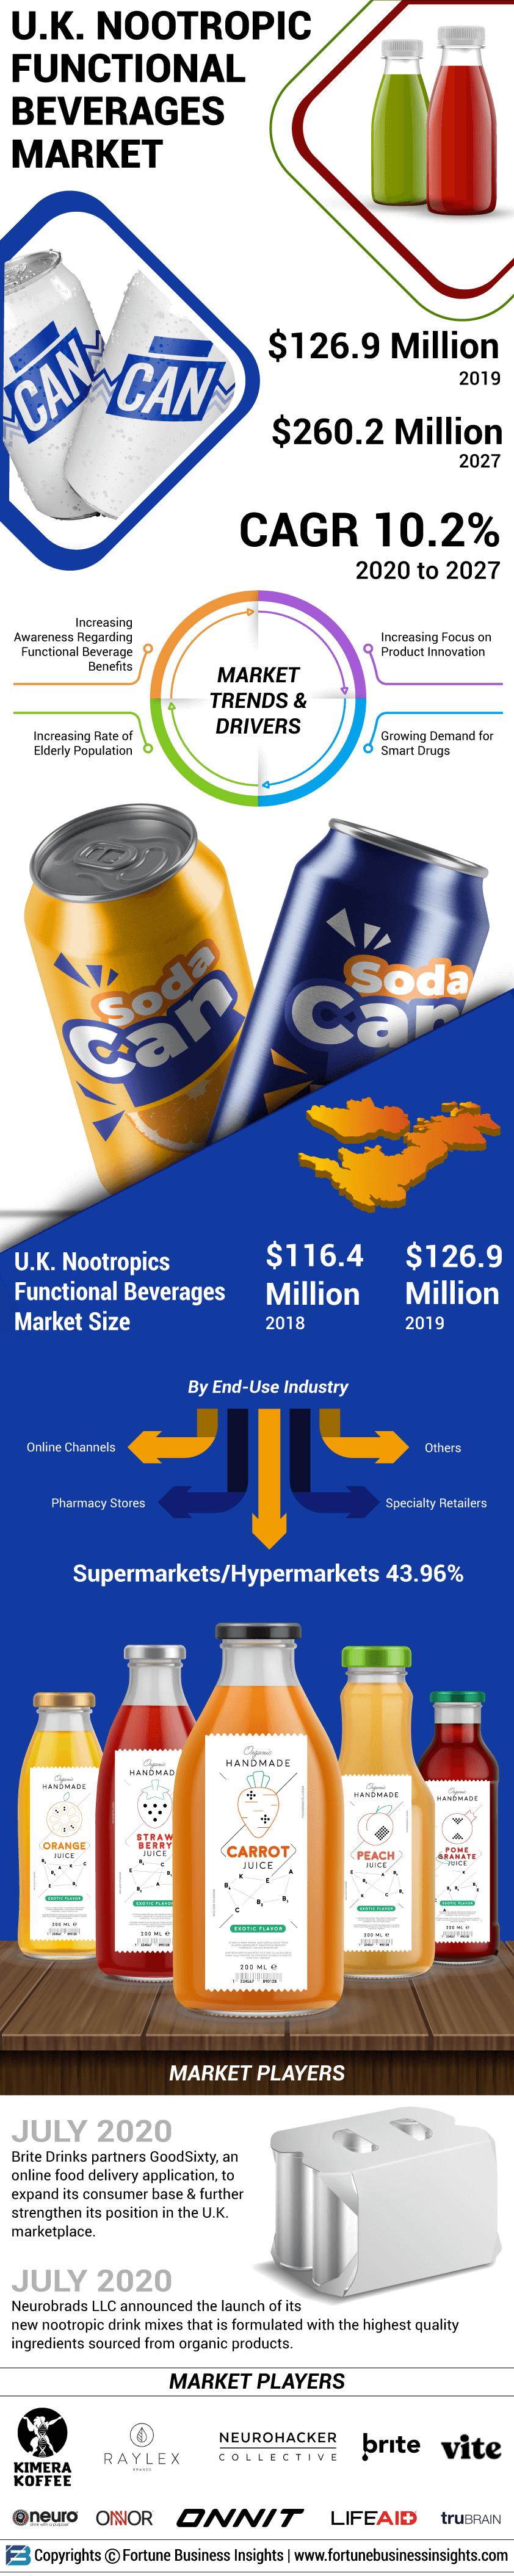 U.K. Nootropic Functional Beverages Market